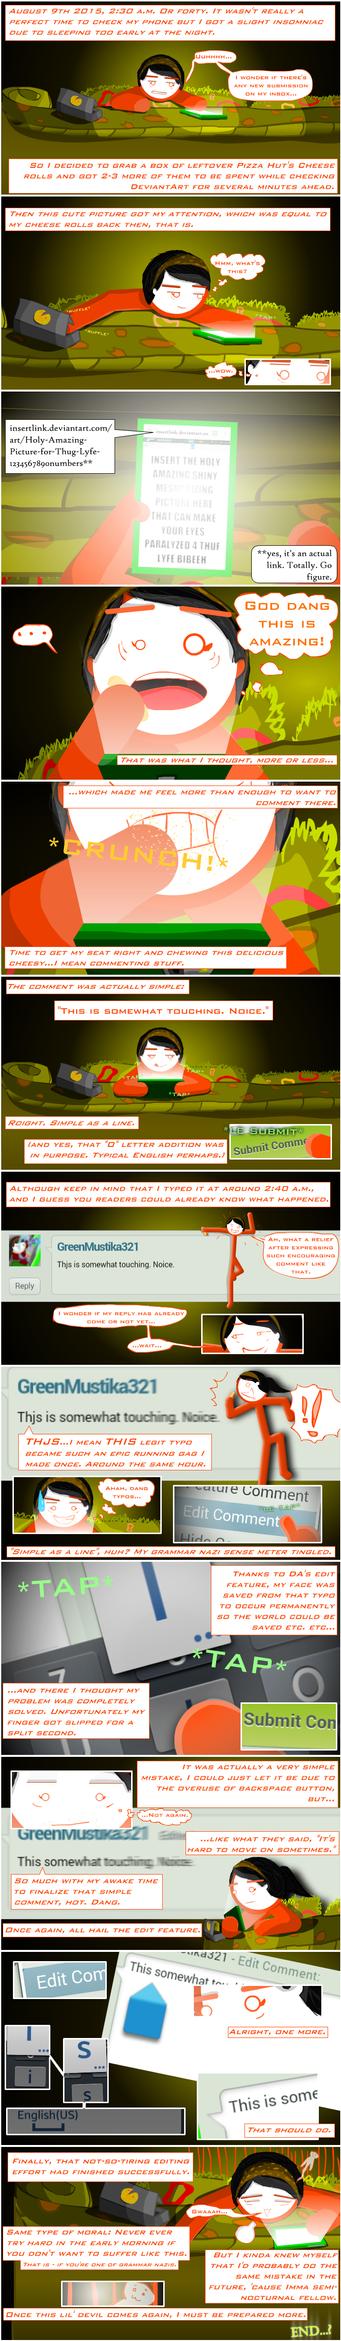 Mustika's Epicly Random Comic - Aug 15 Edition by GreenMustika321